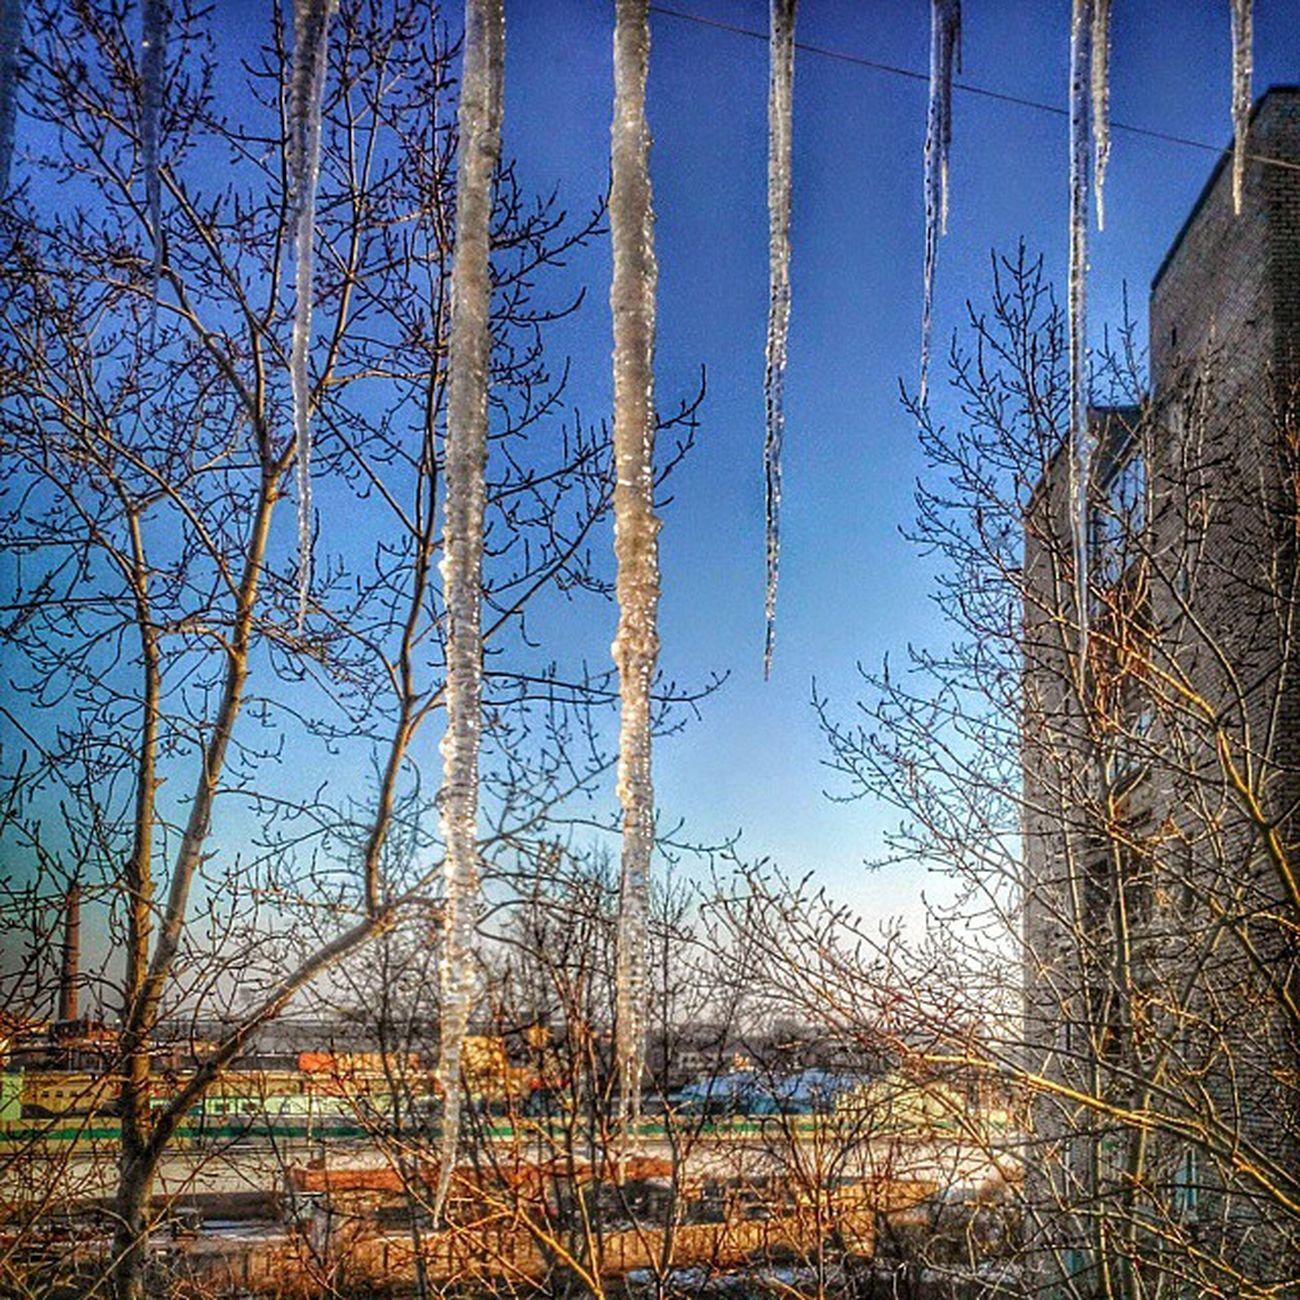 омск сибирь весна март сосульки вечернийомск вечер Закат Omsk Siberia Spring March Evening Sunset Icicle HDR